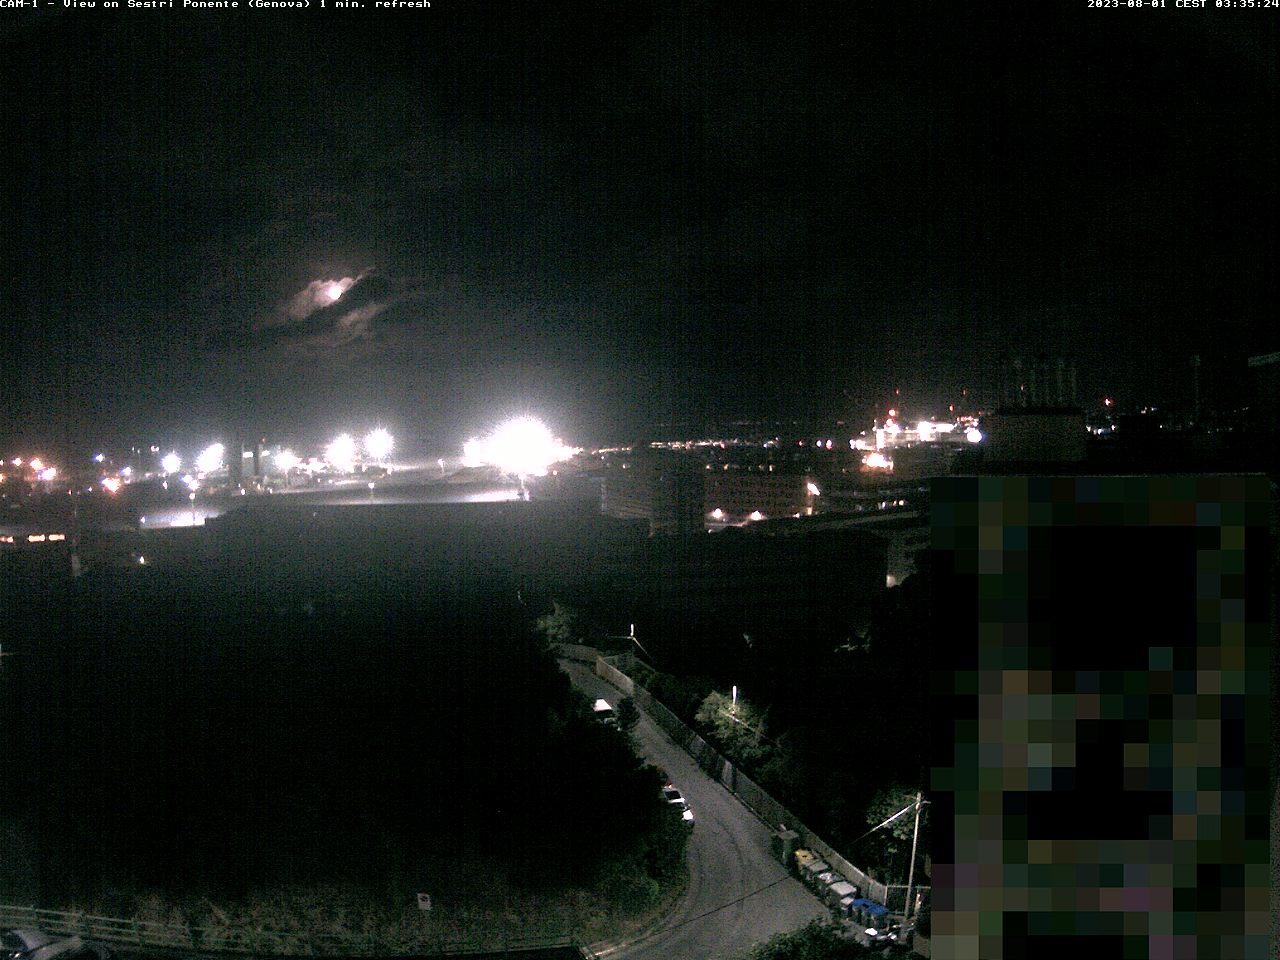 Genova Wed. 03:50